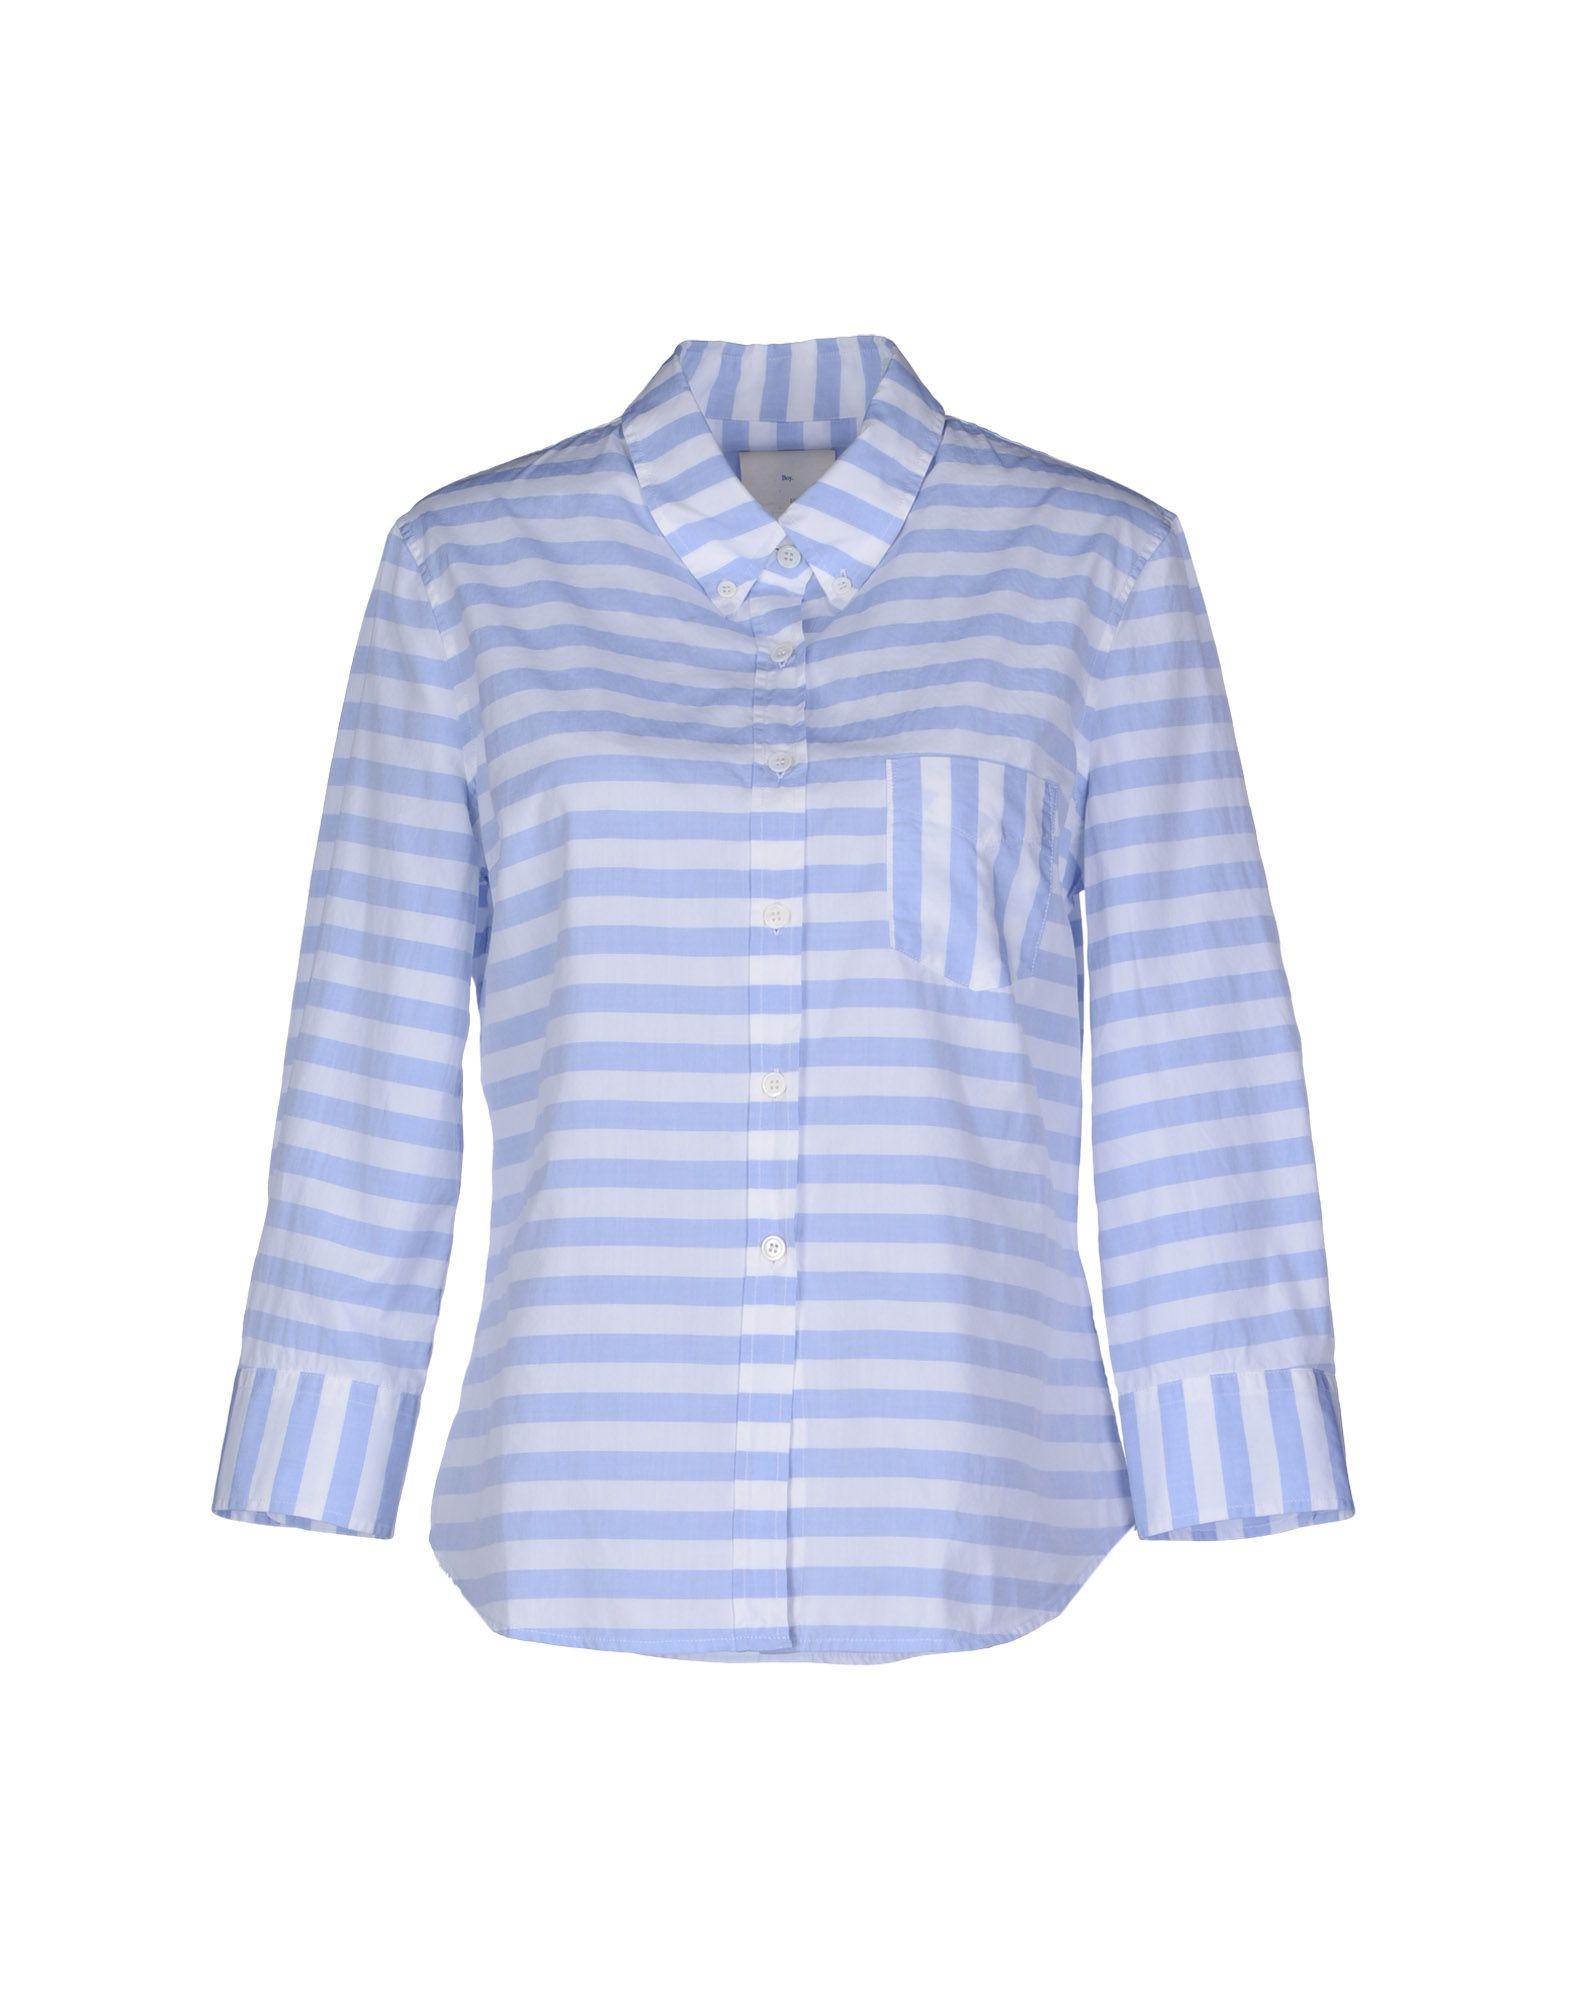 Boy by Band of Outsiders Long-Sleeve shirts ($115, originally $191)